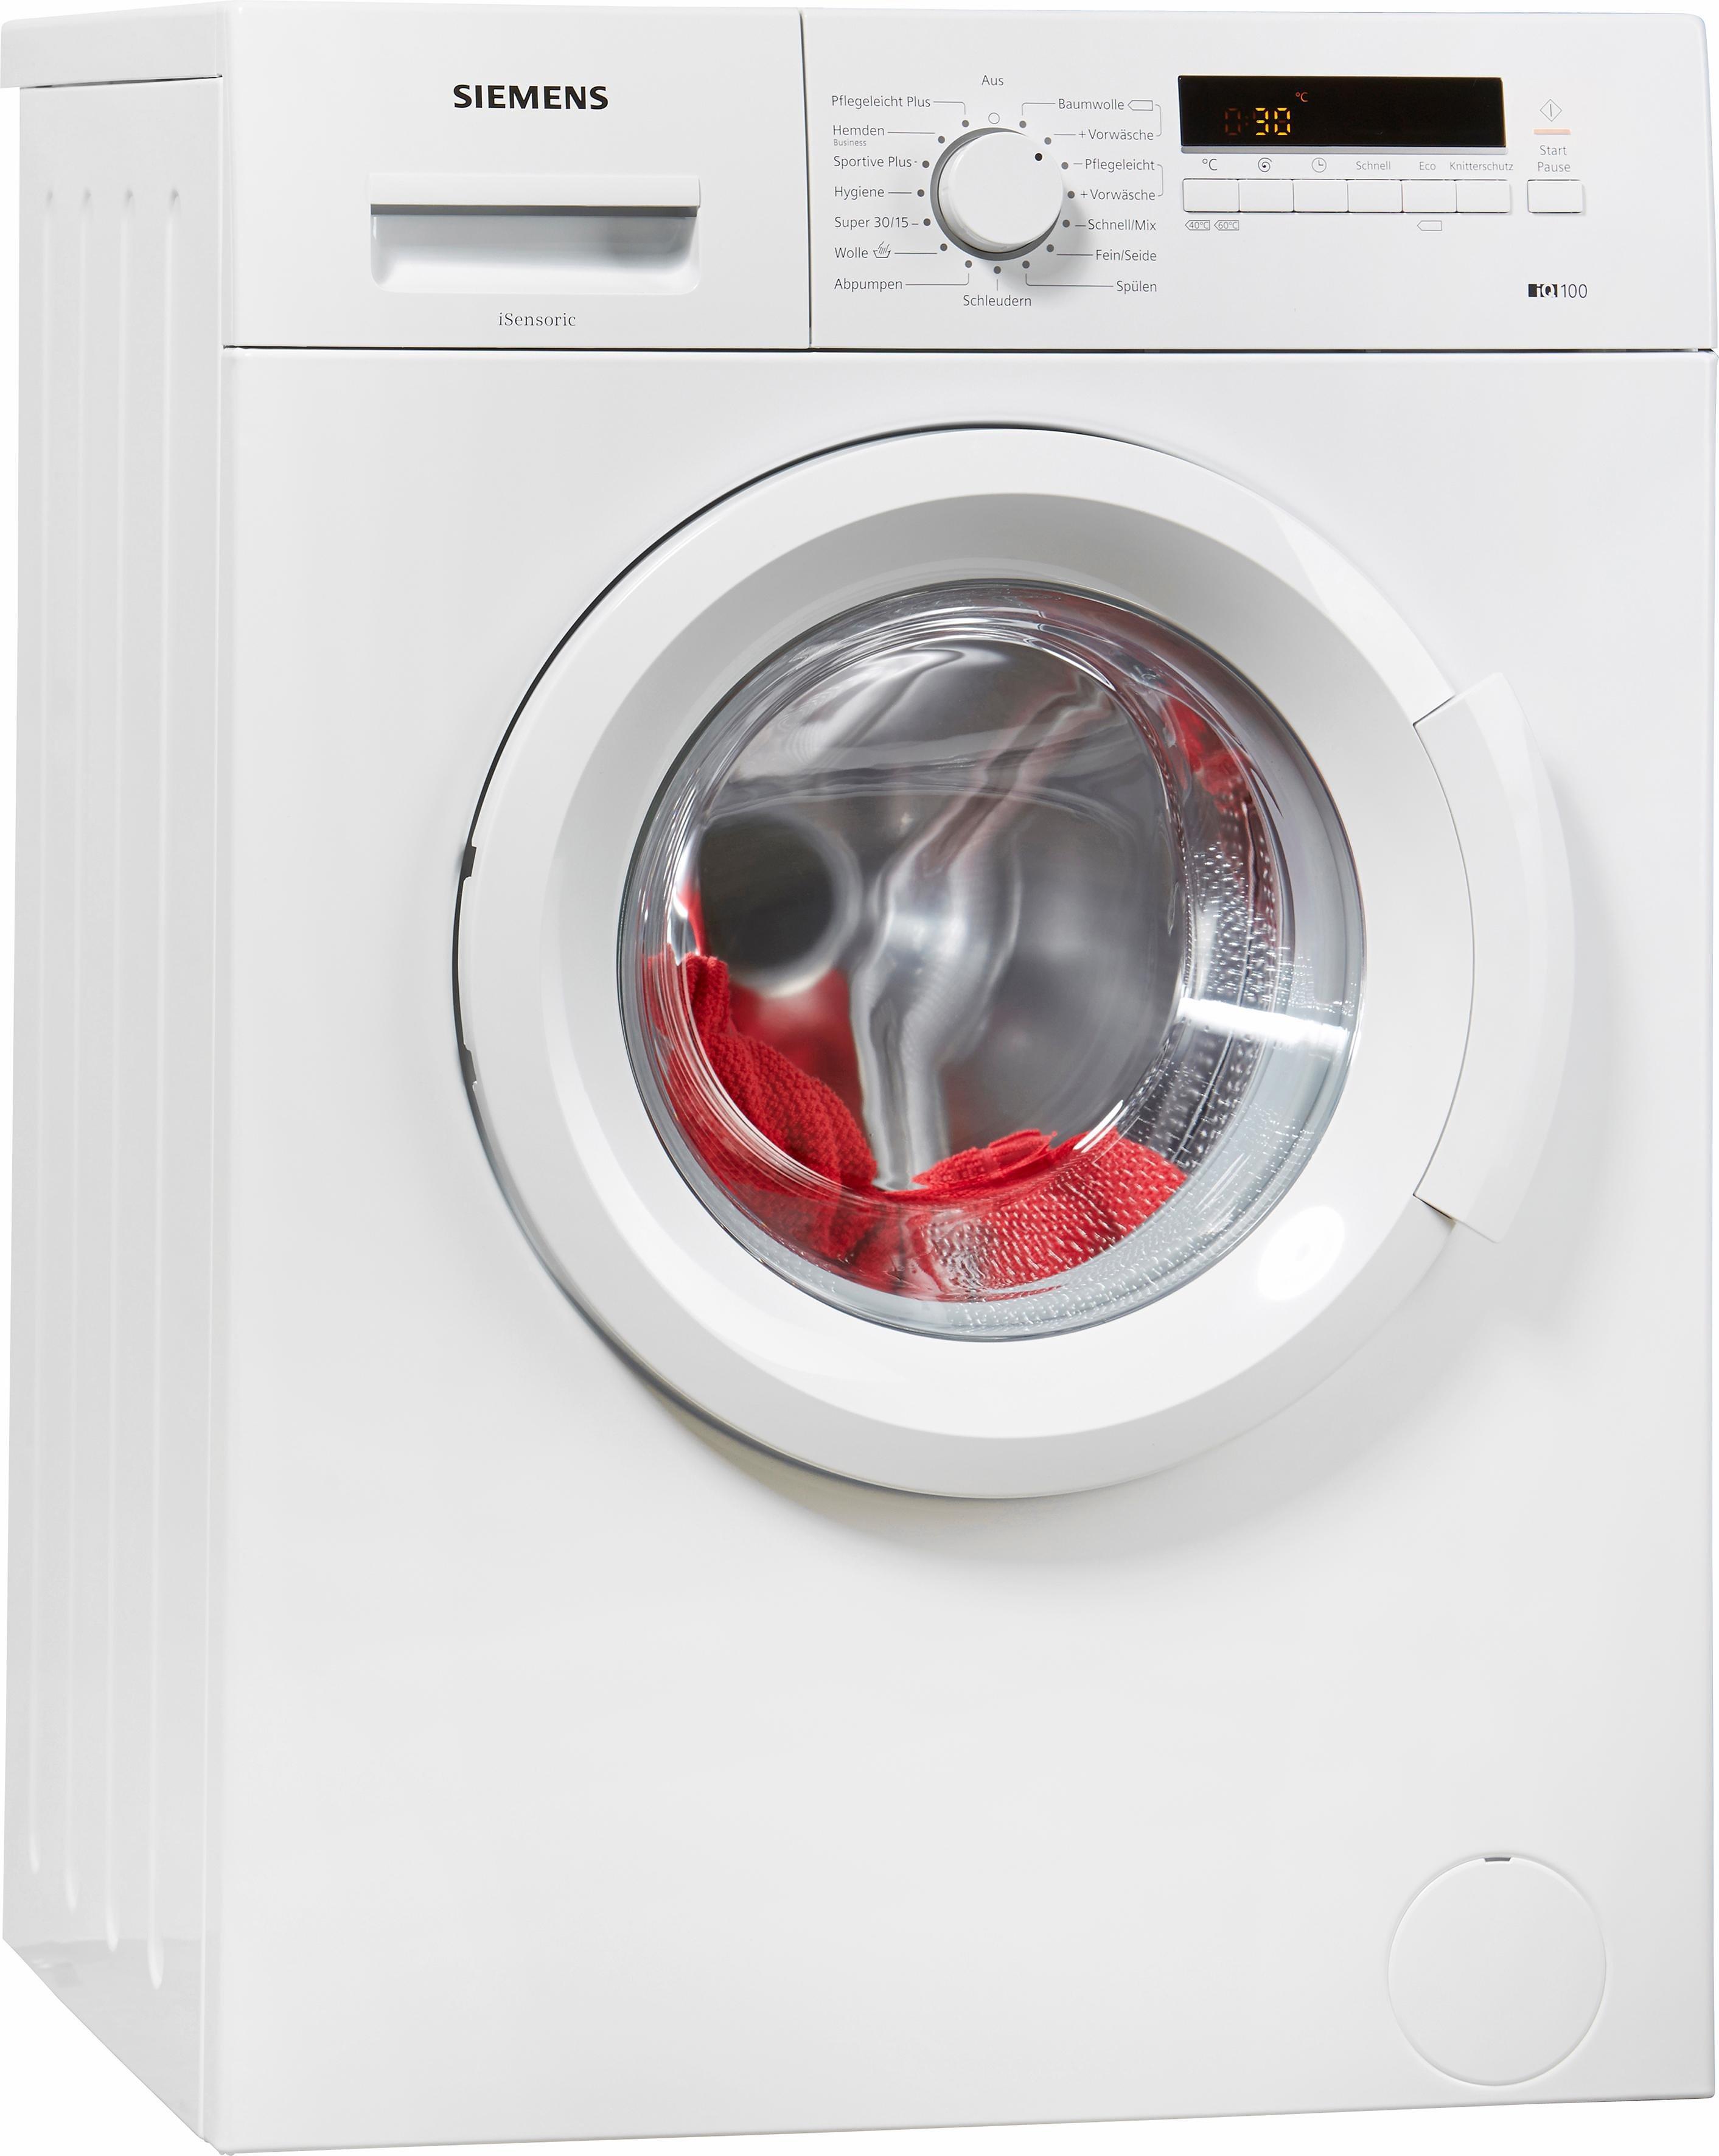 SIEMENS Waschmaschine WM14B222, A+++, 6 kg, 1400 U/Min